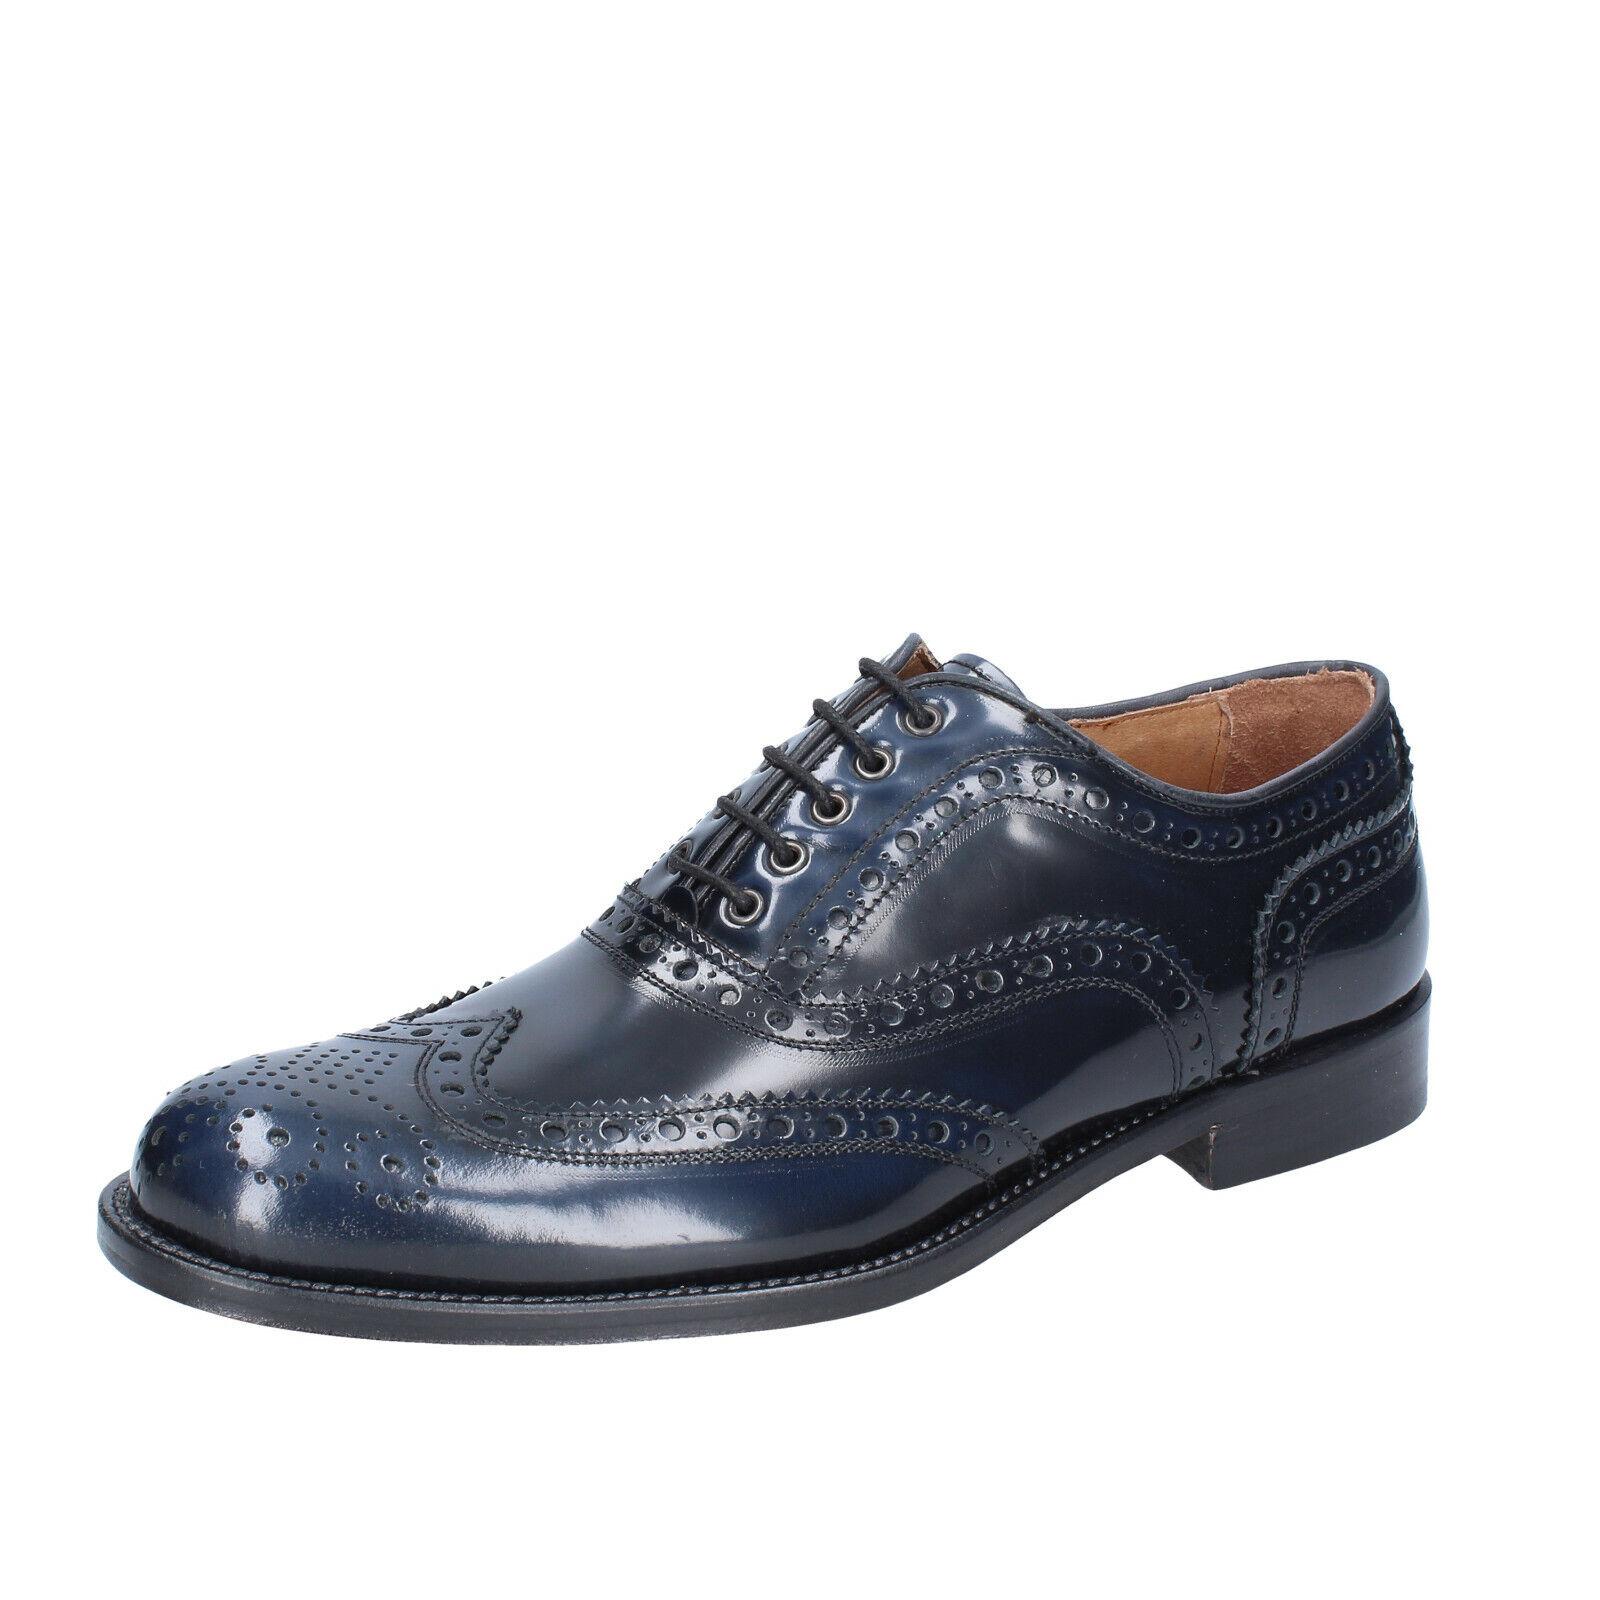 Herren schuhe ALEXANDER 42 EU elegante blau glänzendem leder BS212-42